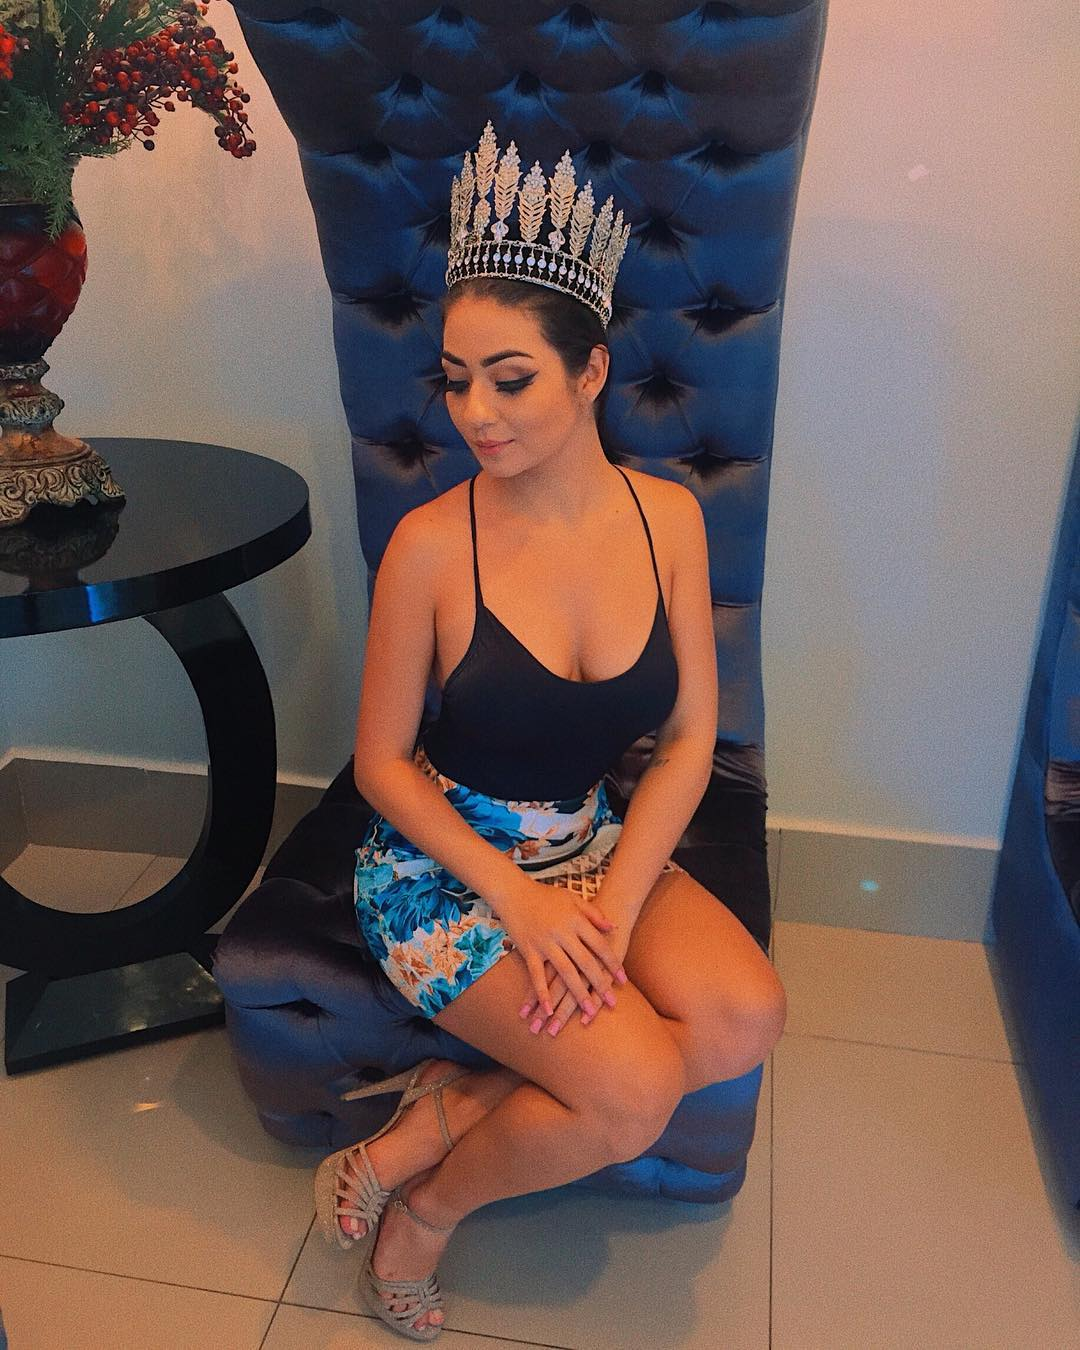 miss araguaia, ilhas (ilhas do araguaia) mundo 2017, quetlin heidrich. - Página 2 18513110